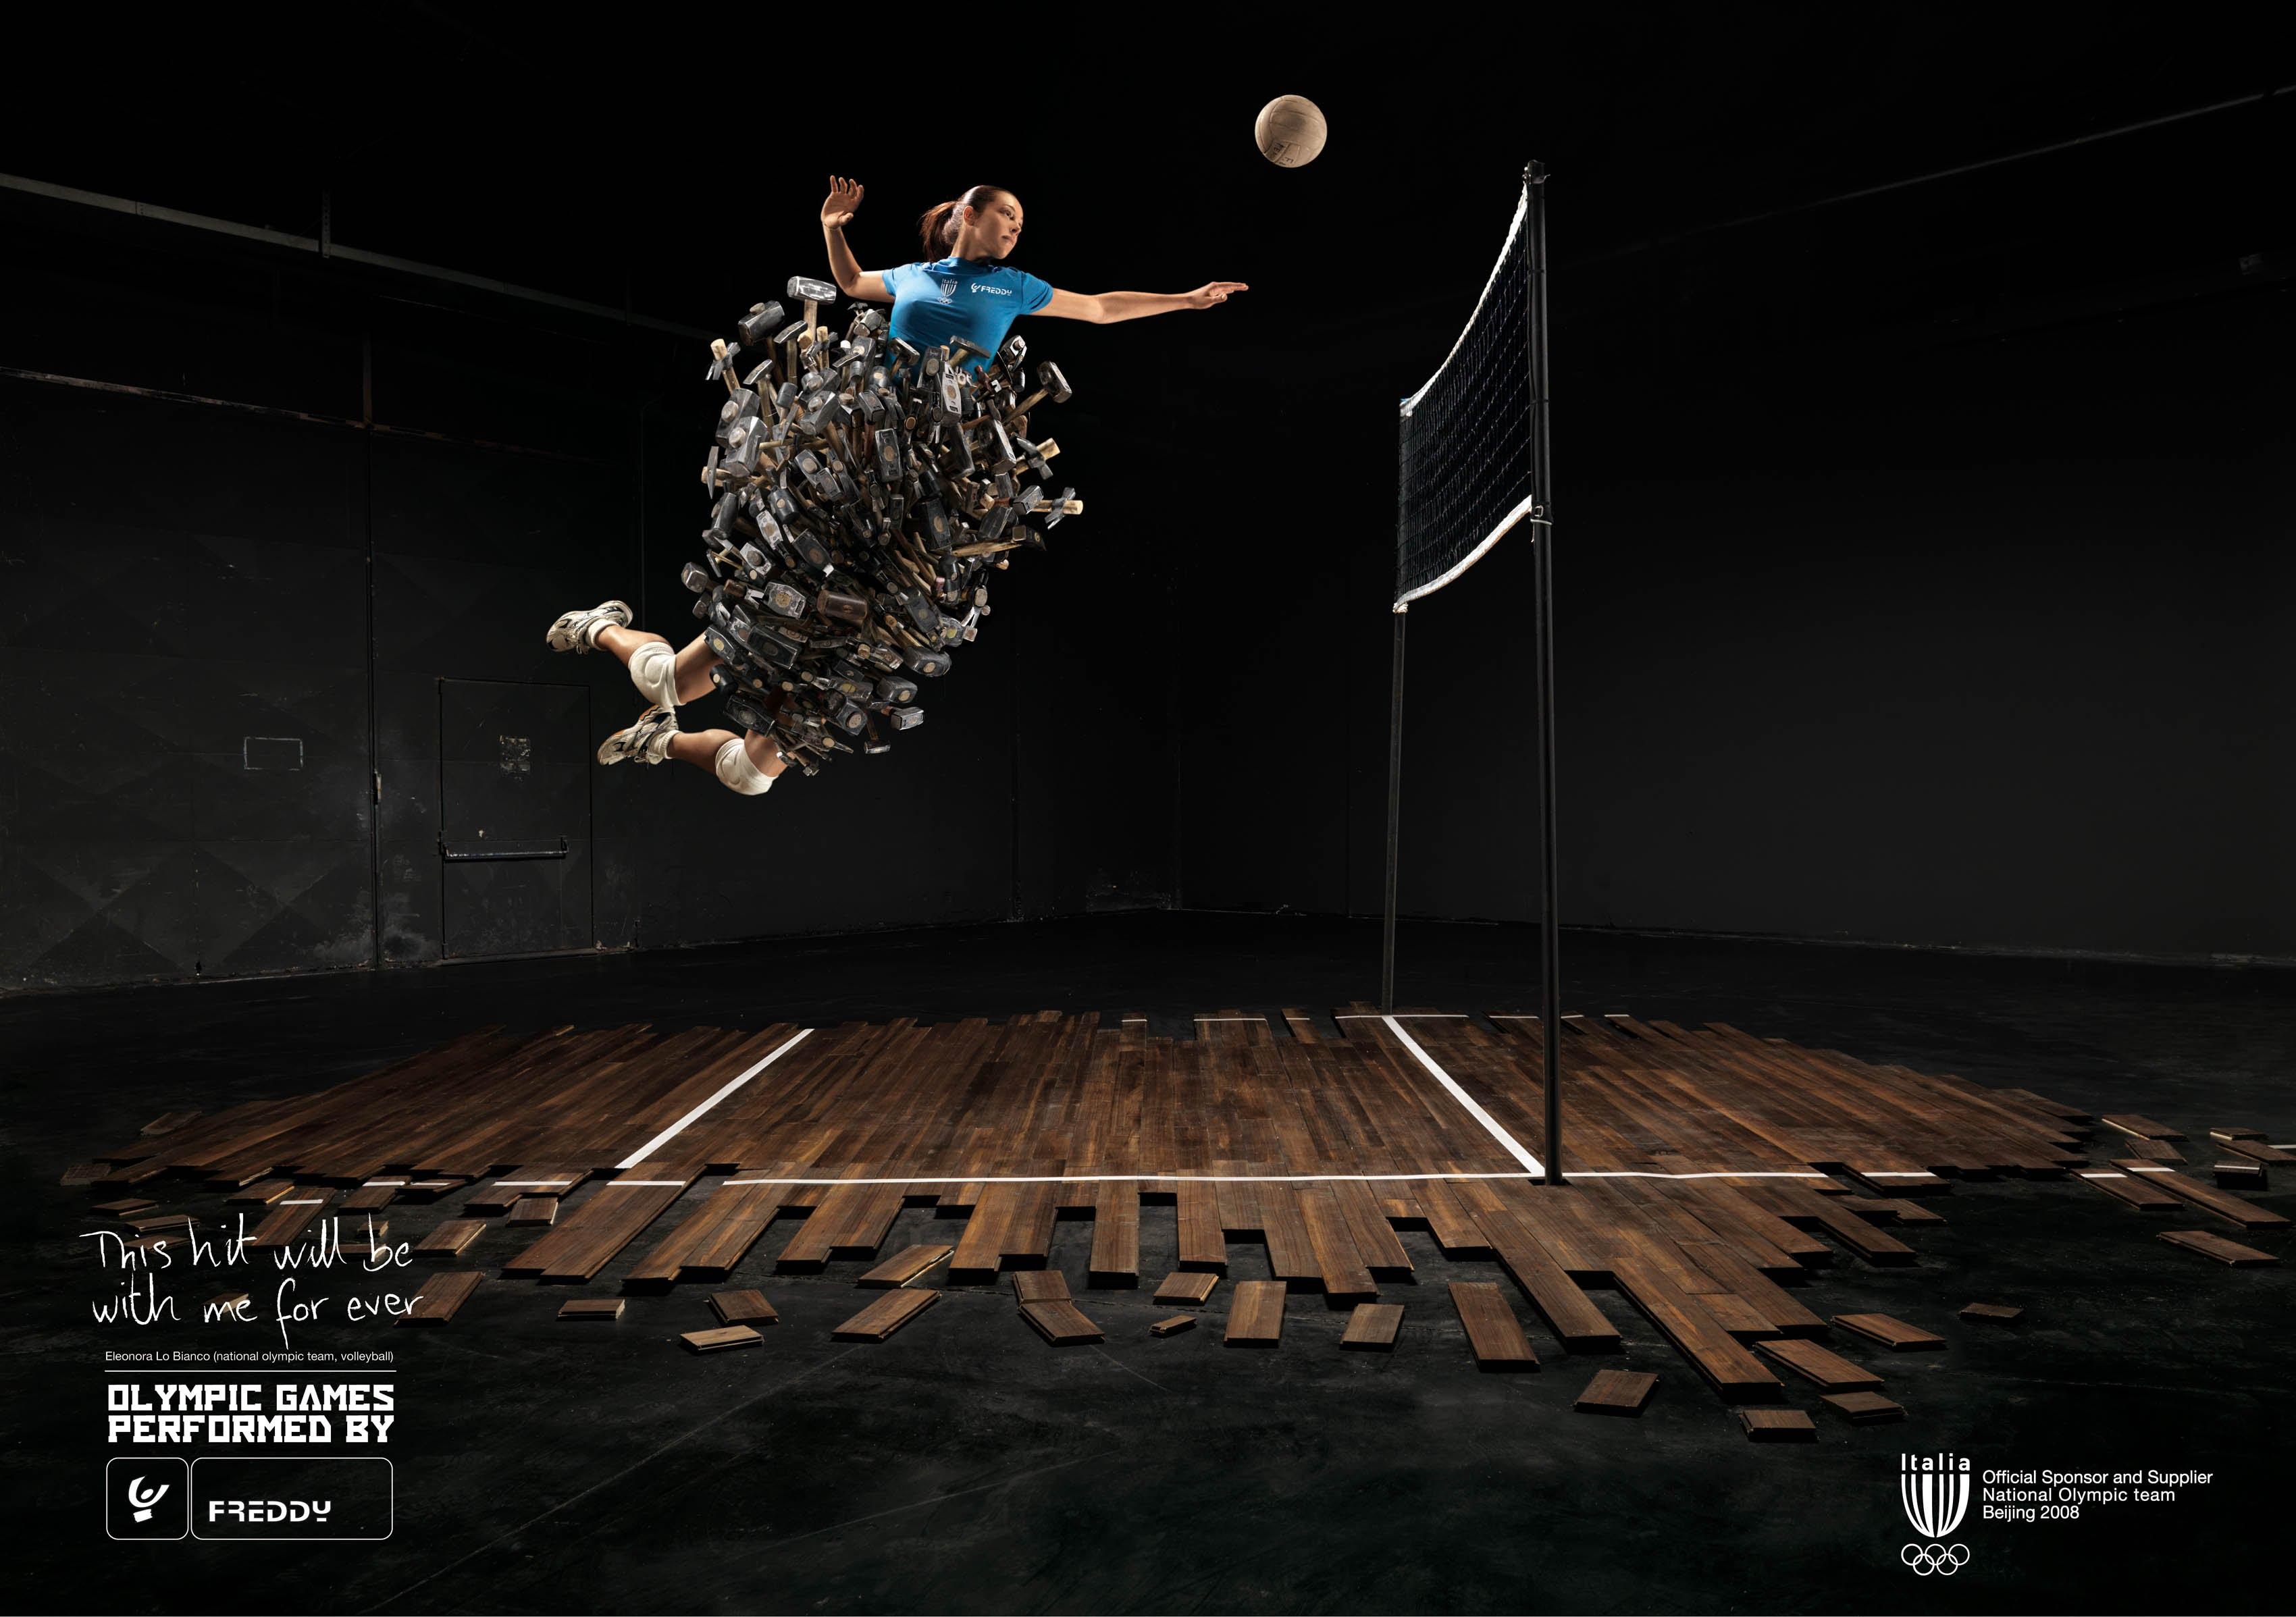 логотип летней олимпиады